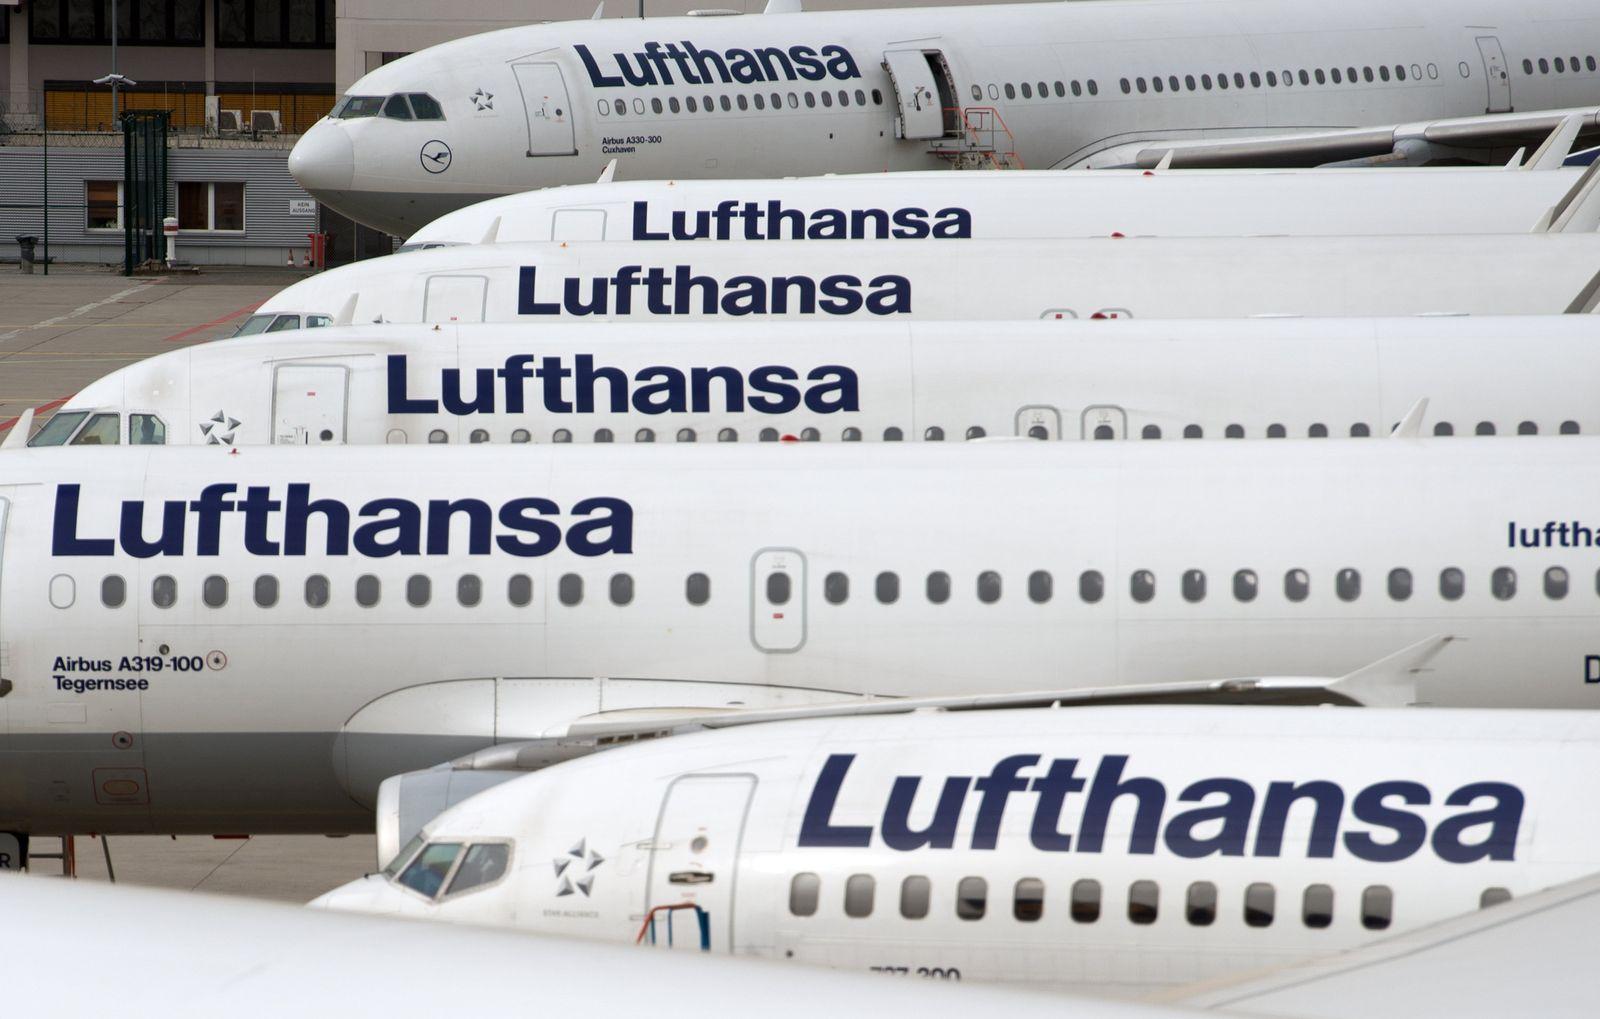 Lufthansa Pilotenstreik - Frankfurt